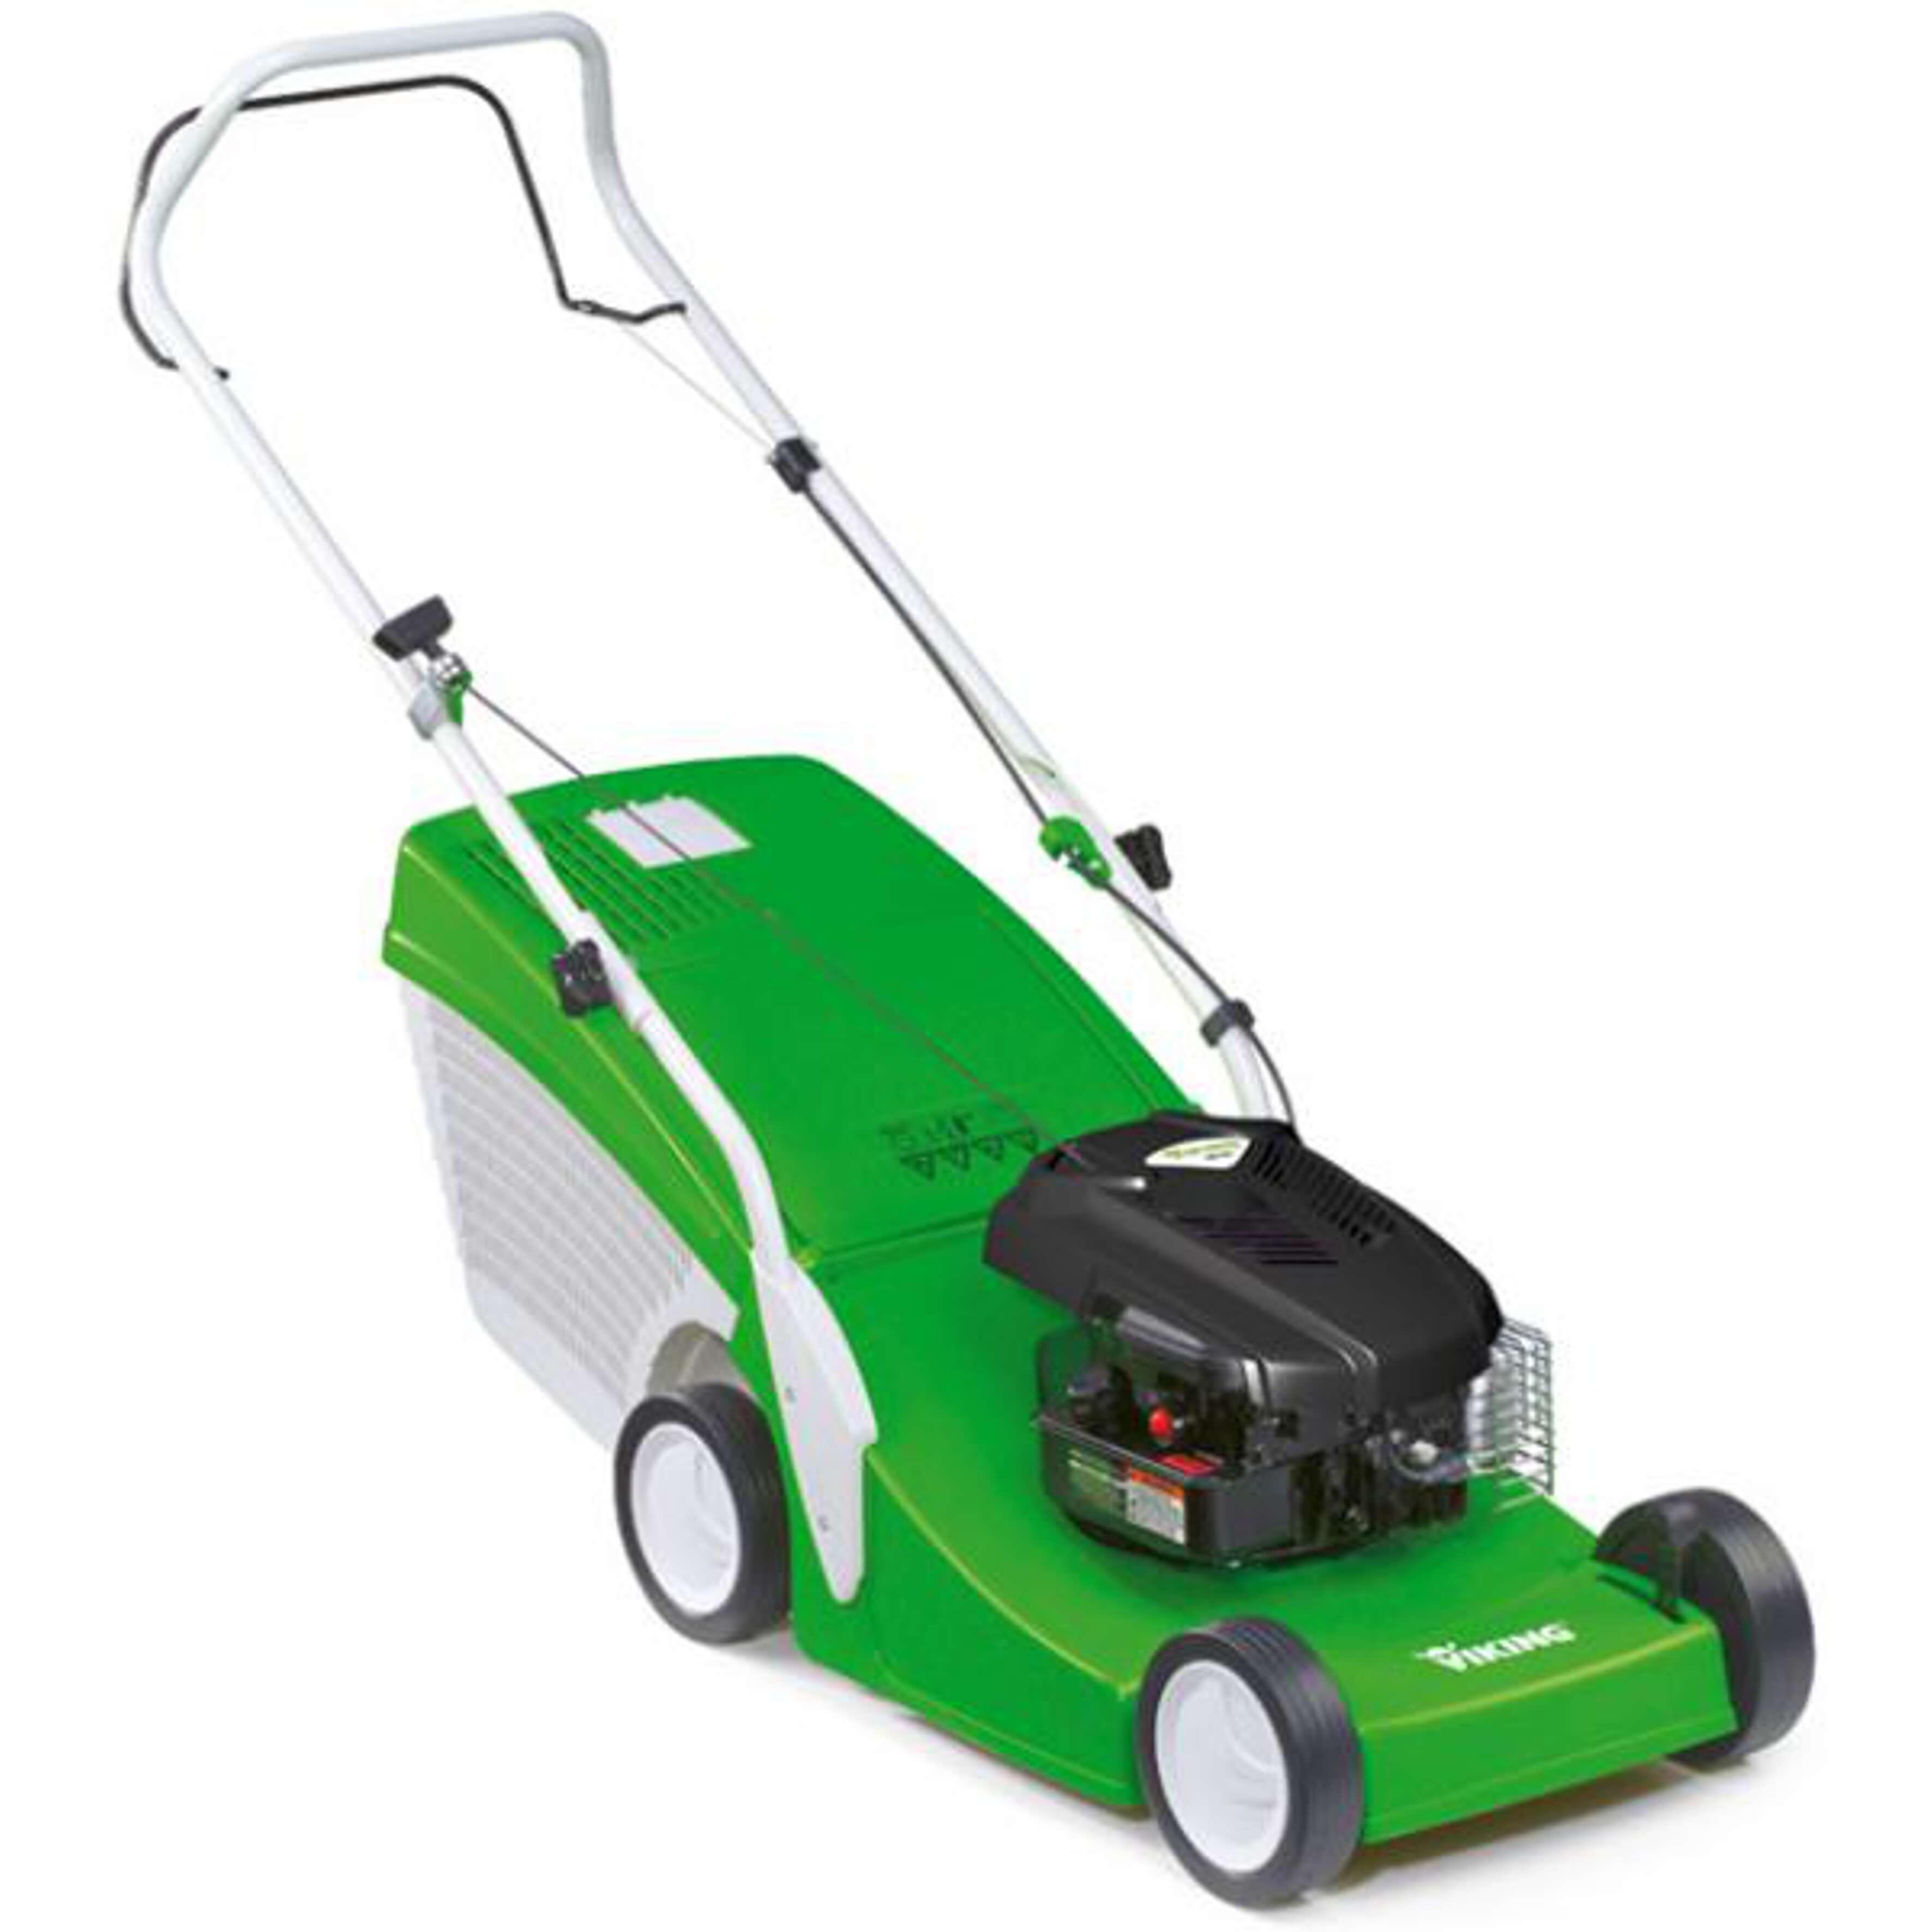 Viking MB 443.1 T Petrol Lawn Mowers